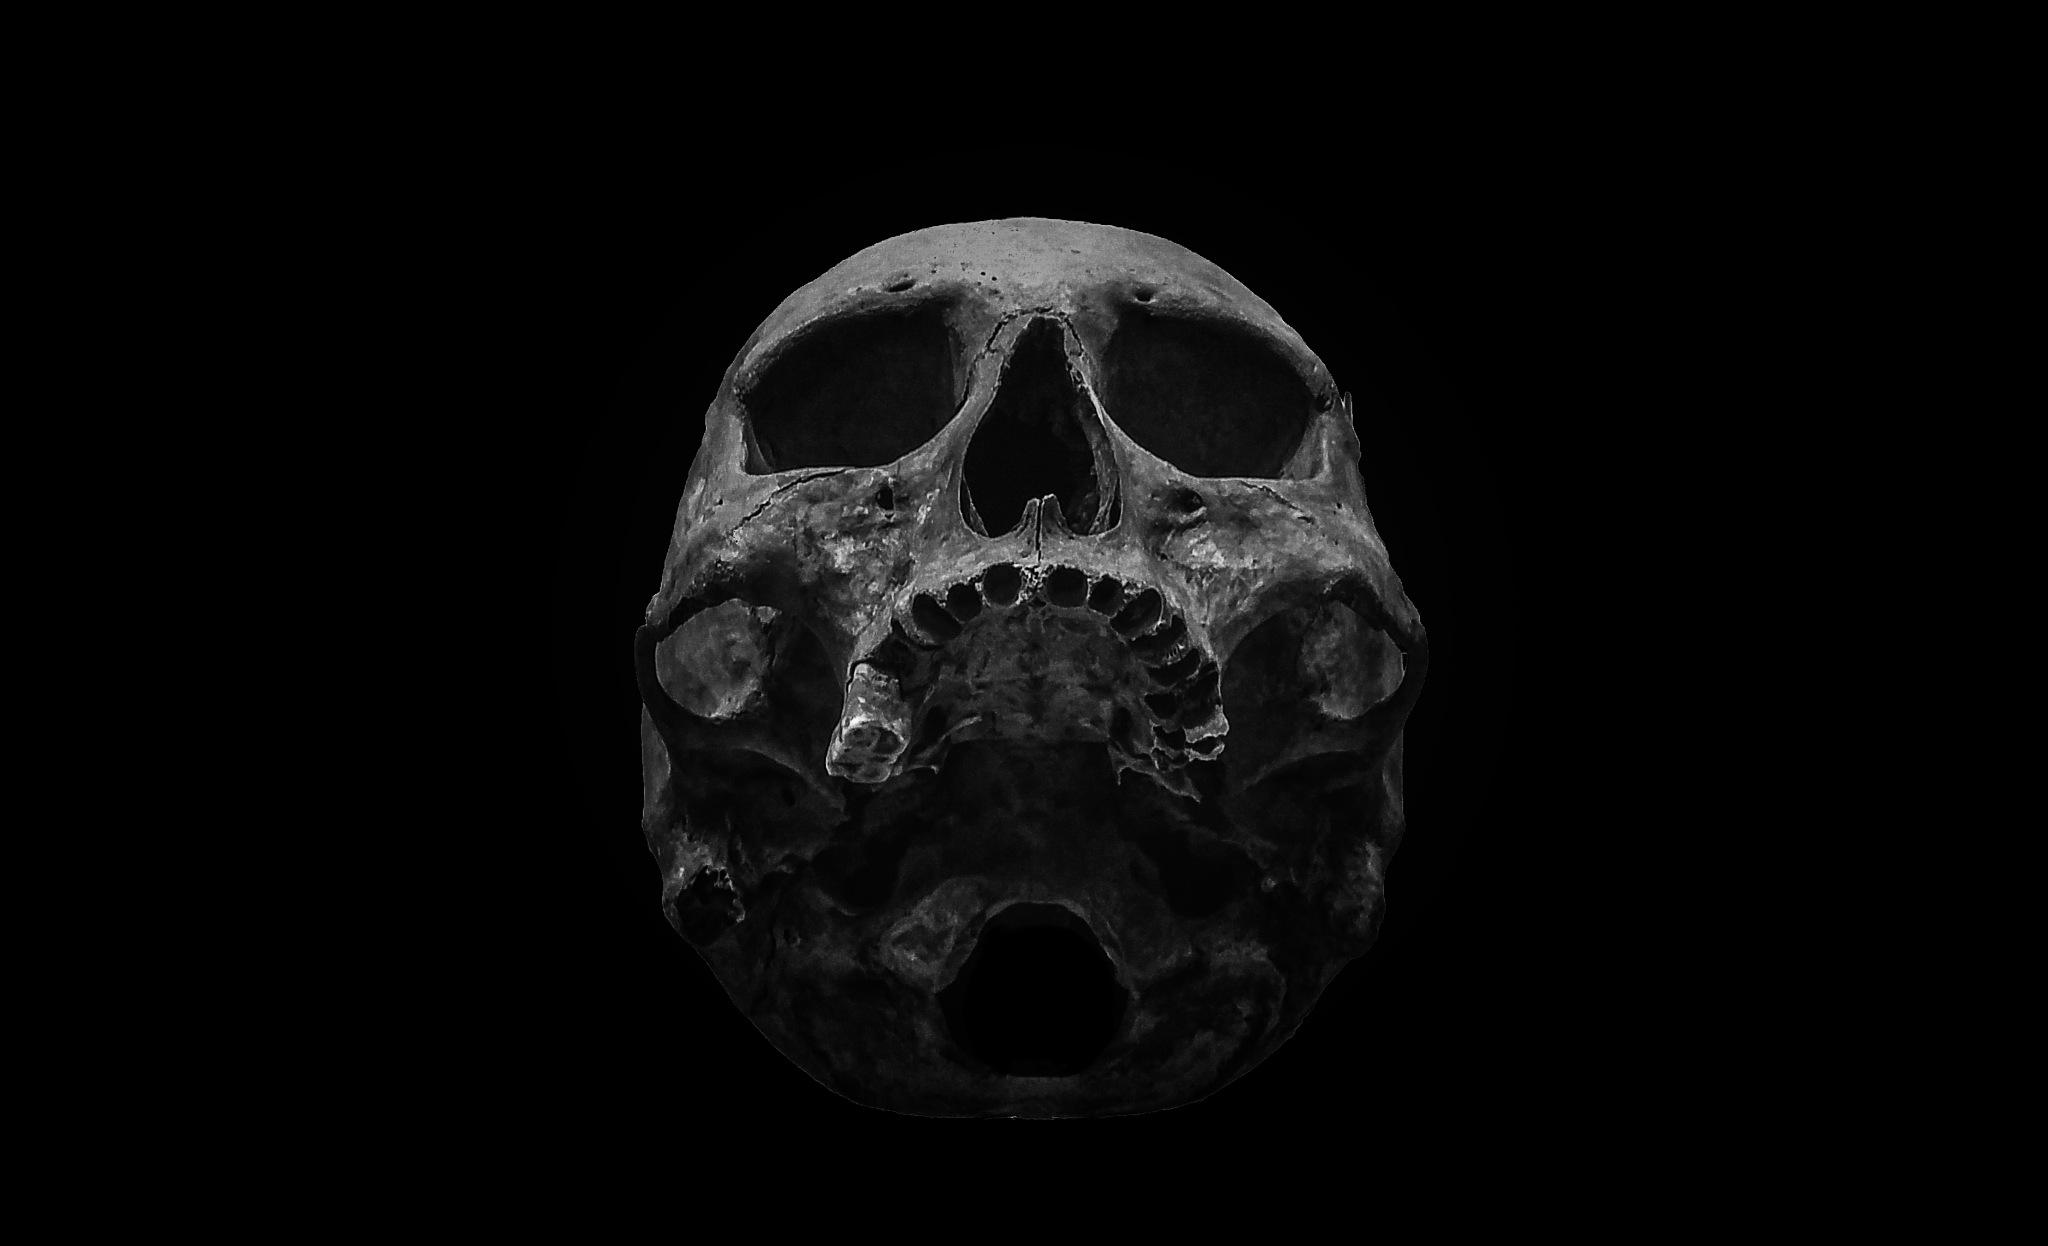 Skull by Gary Tripp